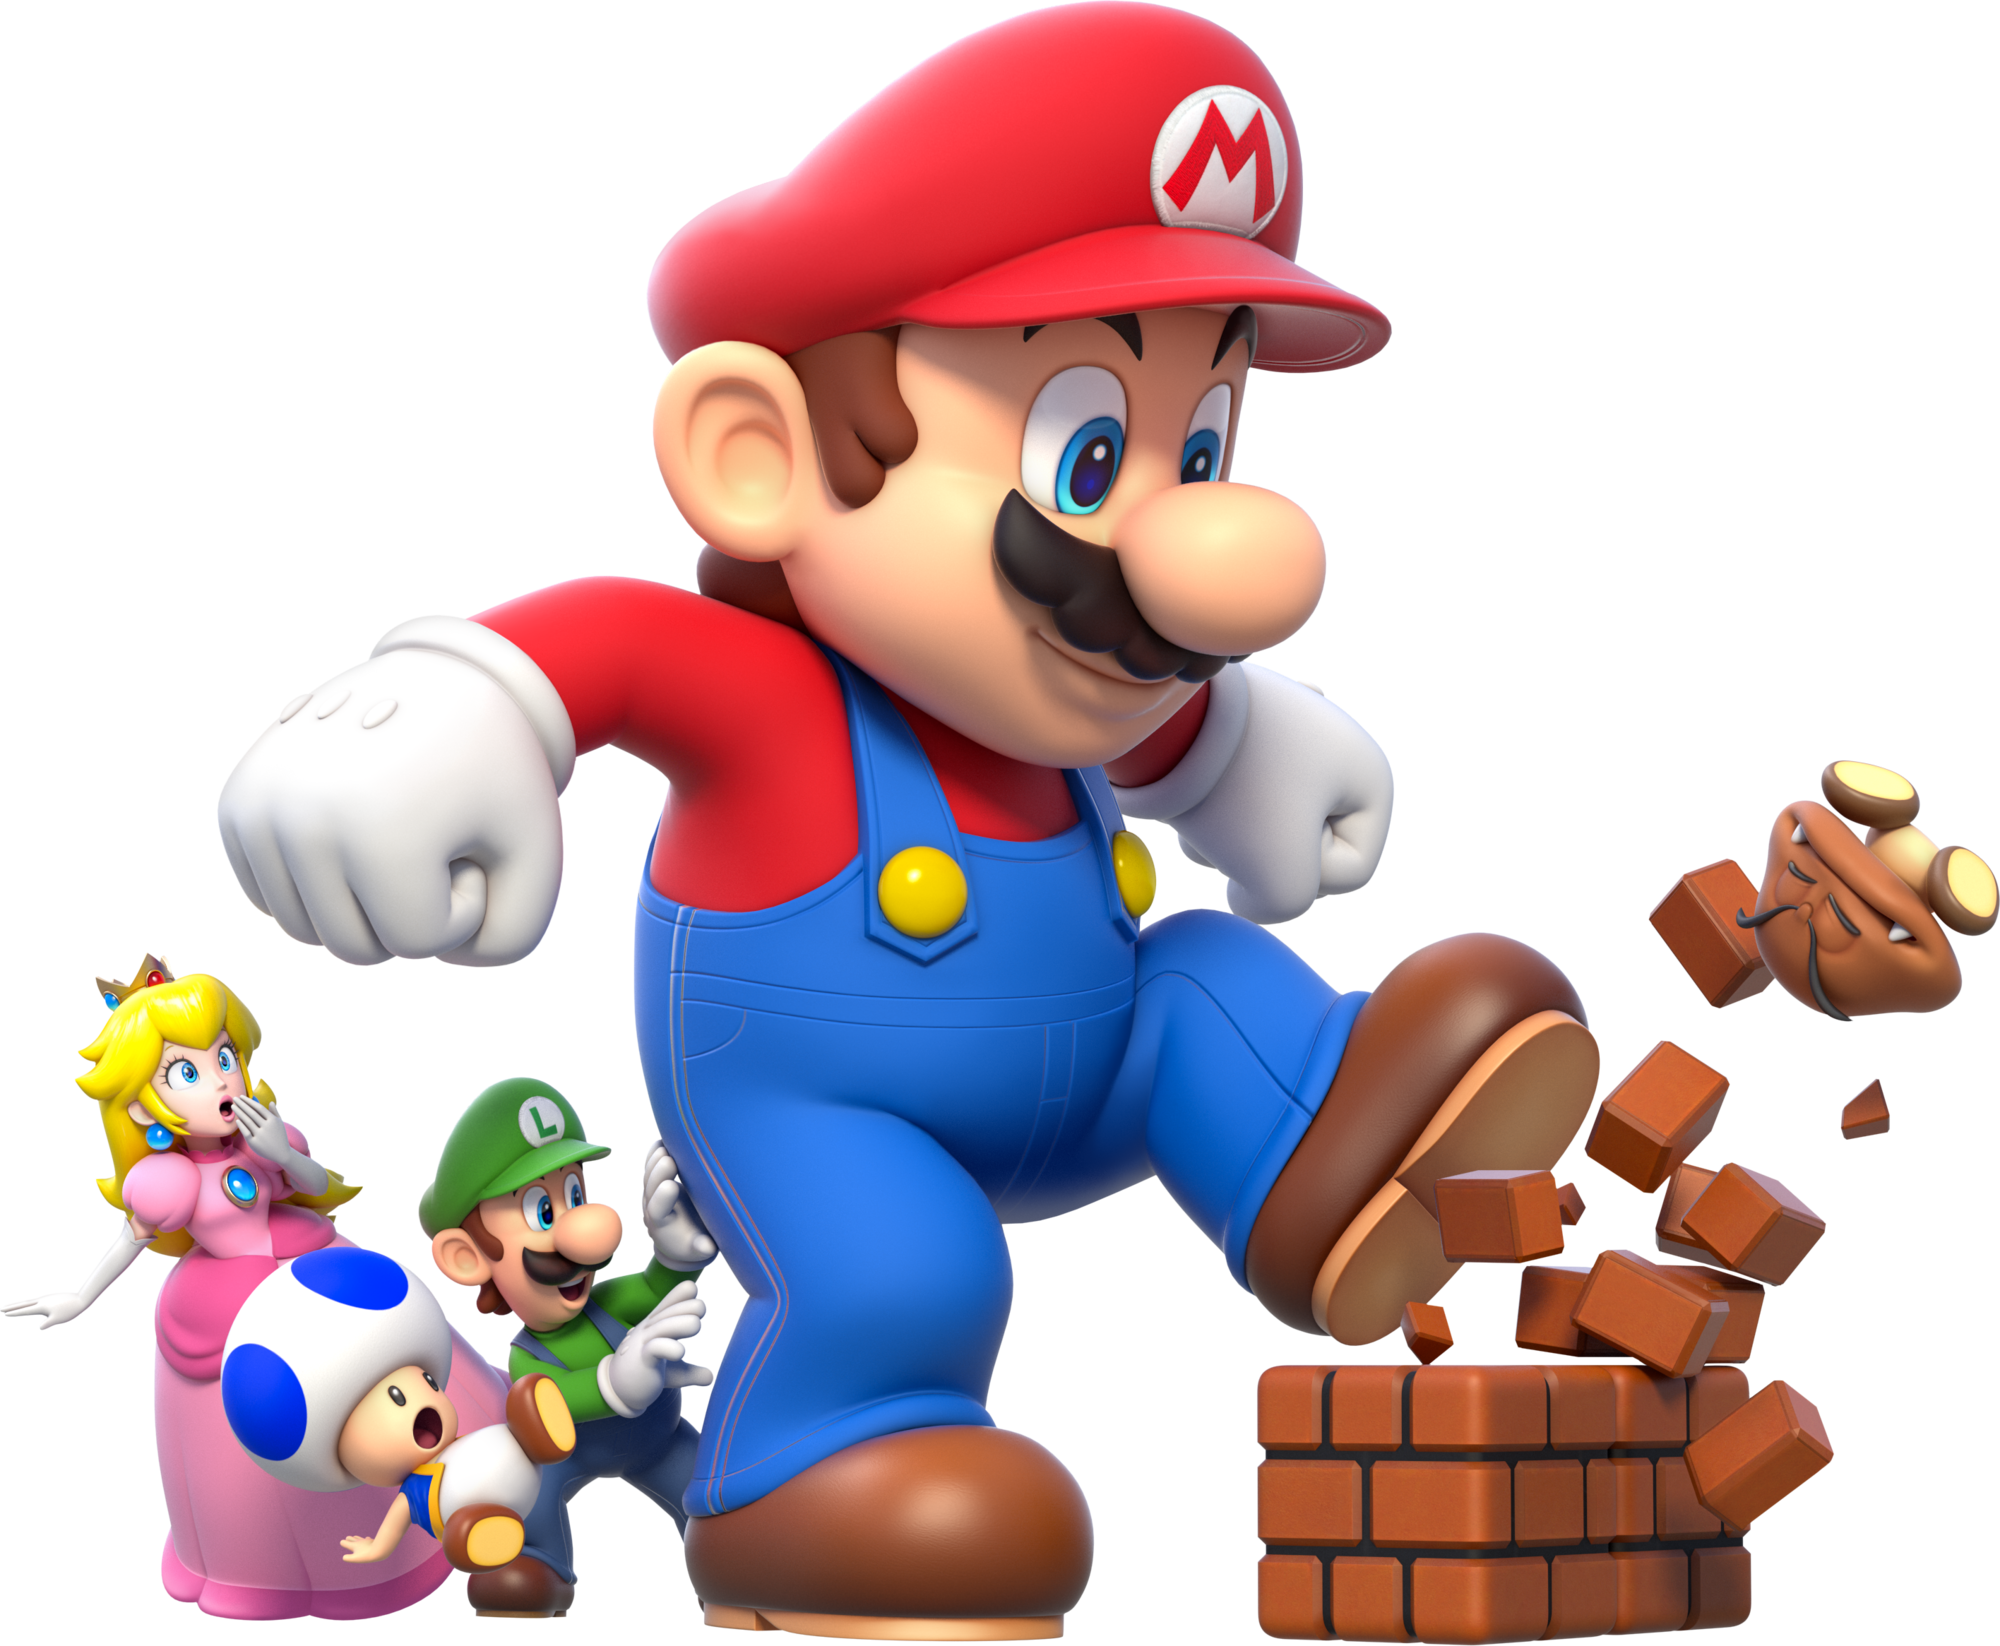 Mario clipart mario block. Image mega group artwork